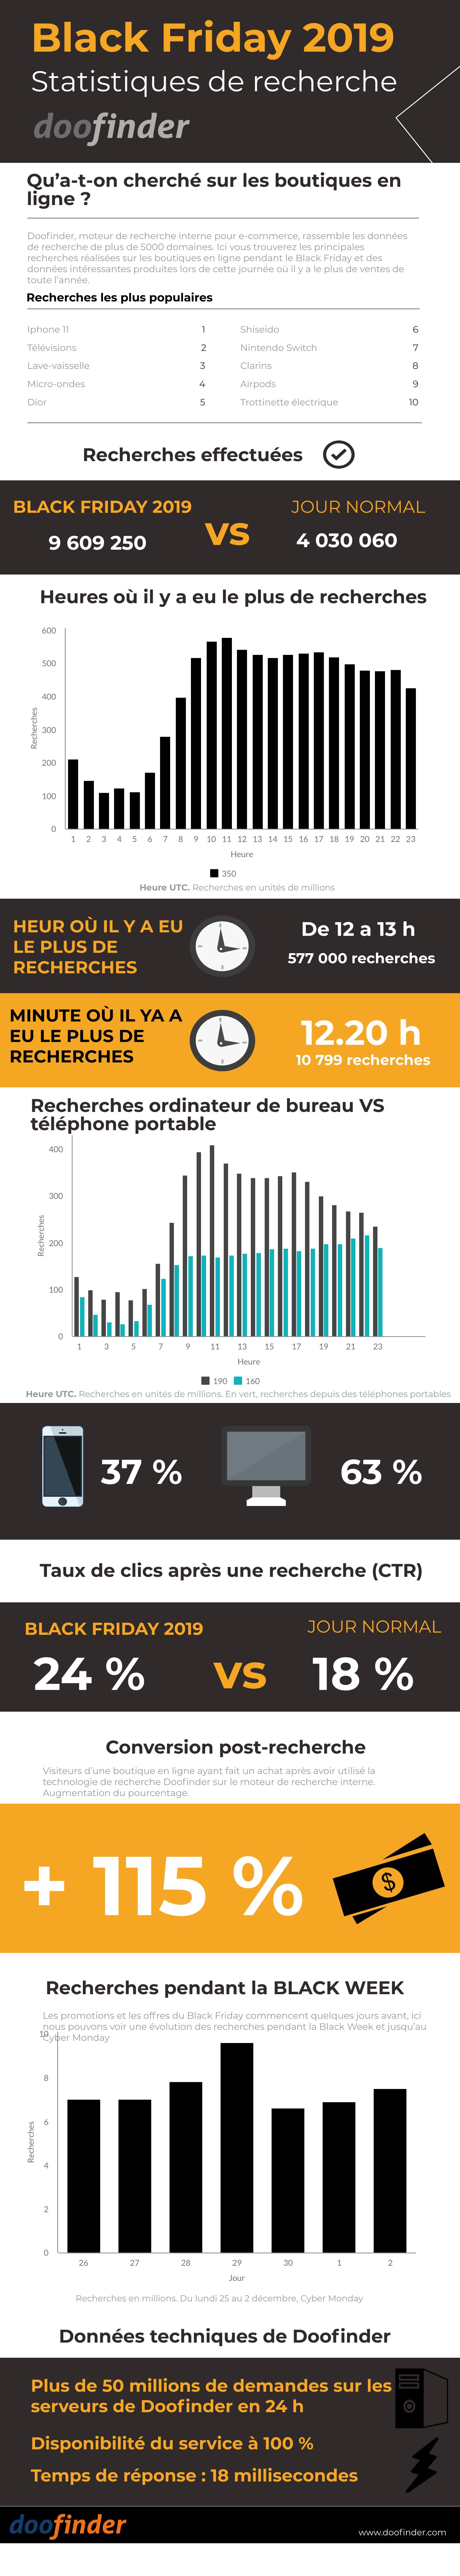 Statistiques_recherche_Black_Friday_2019